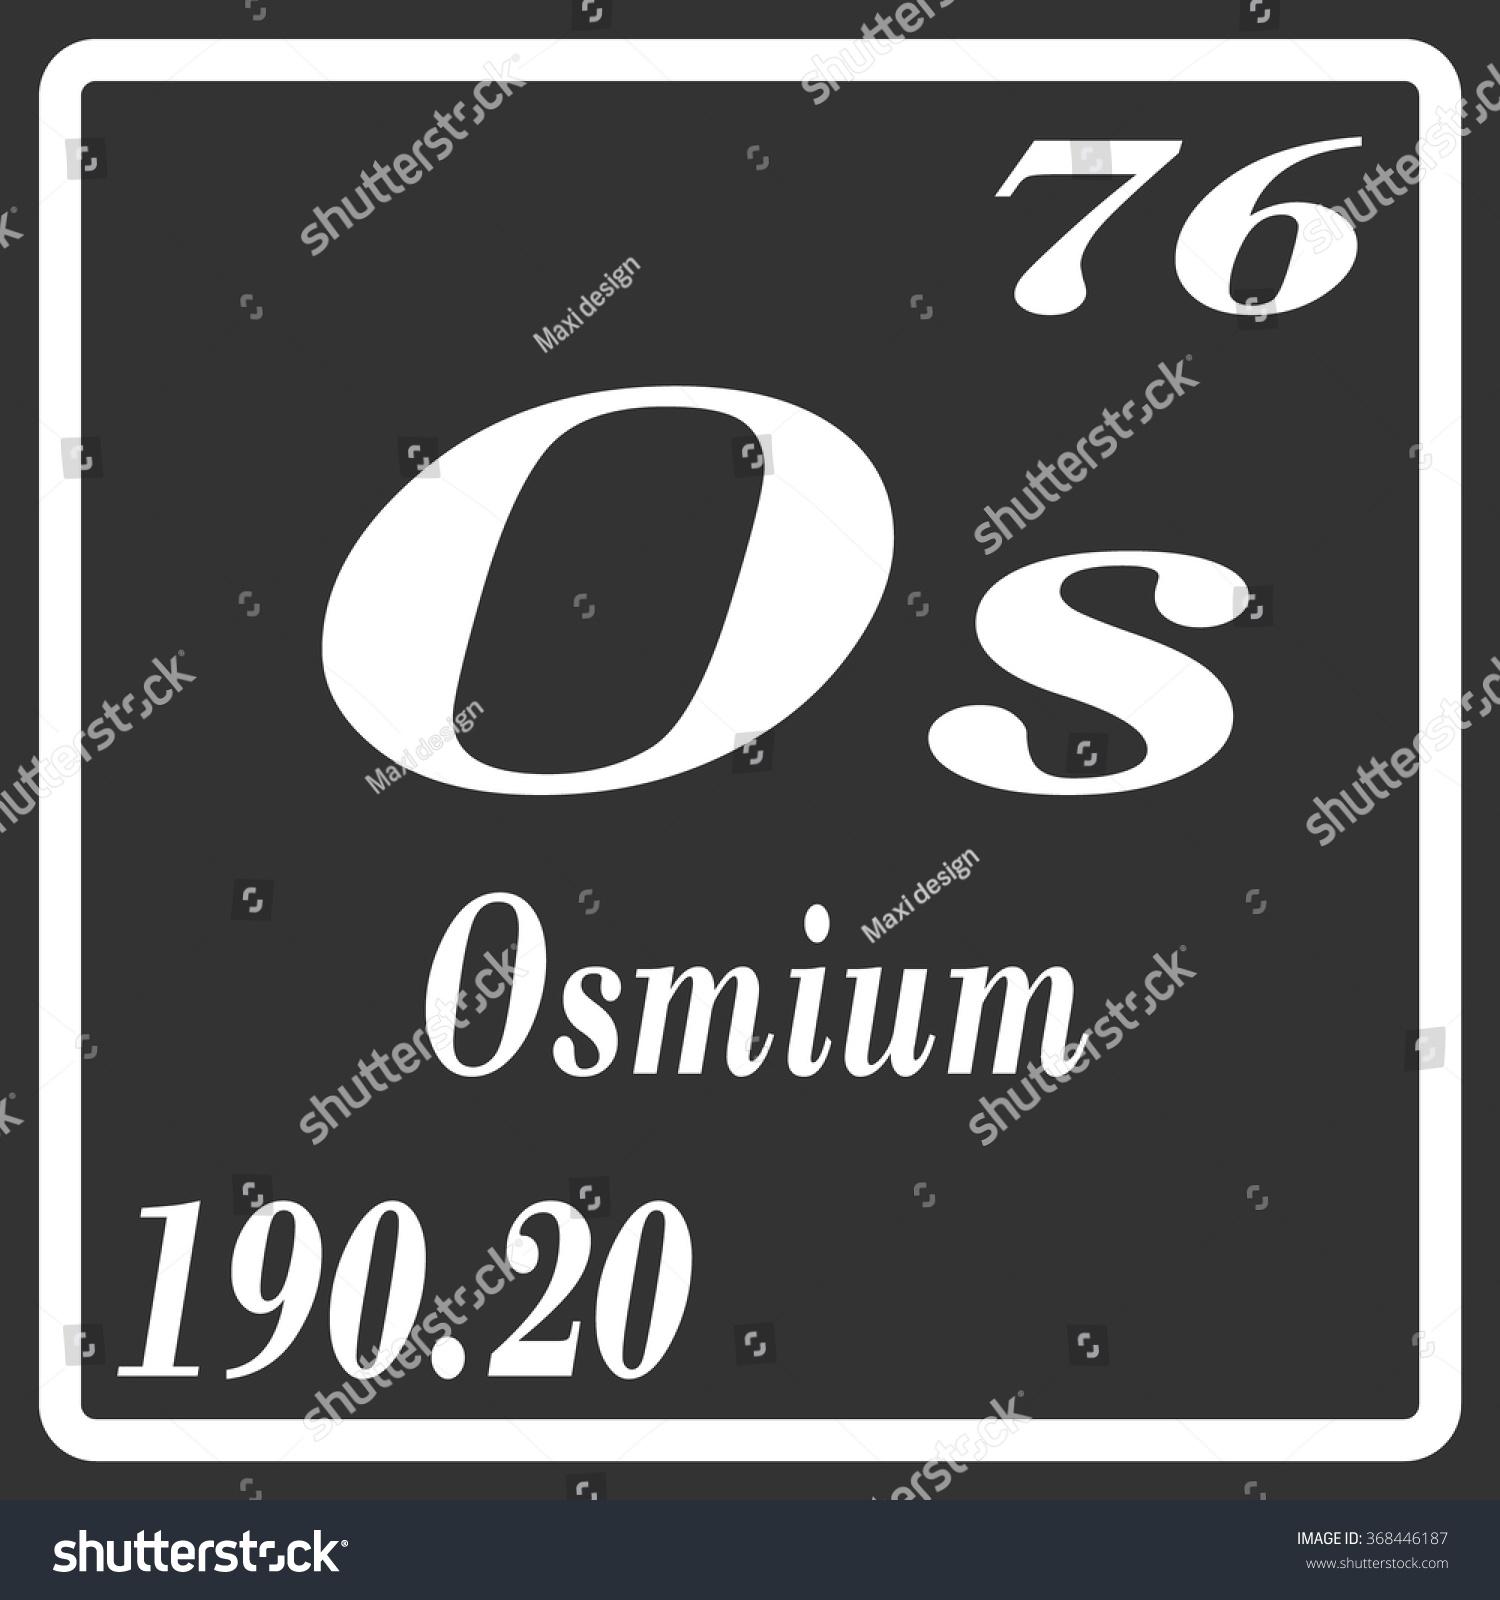 Periodic table elements osmium stock vector 368446187 shutterstock periodic table of elements osmium urtaz Images